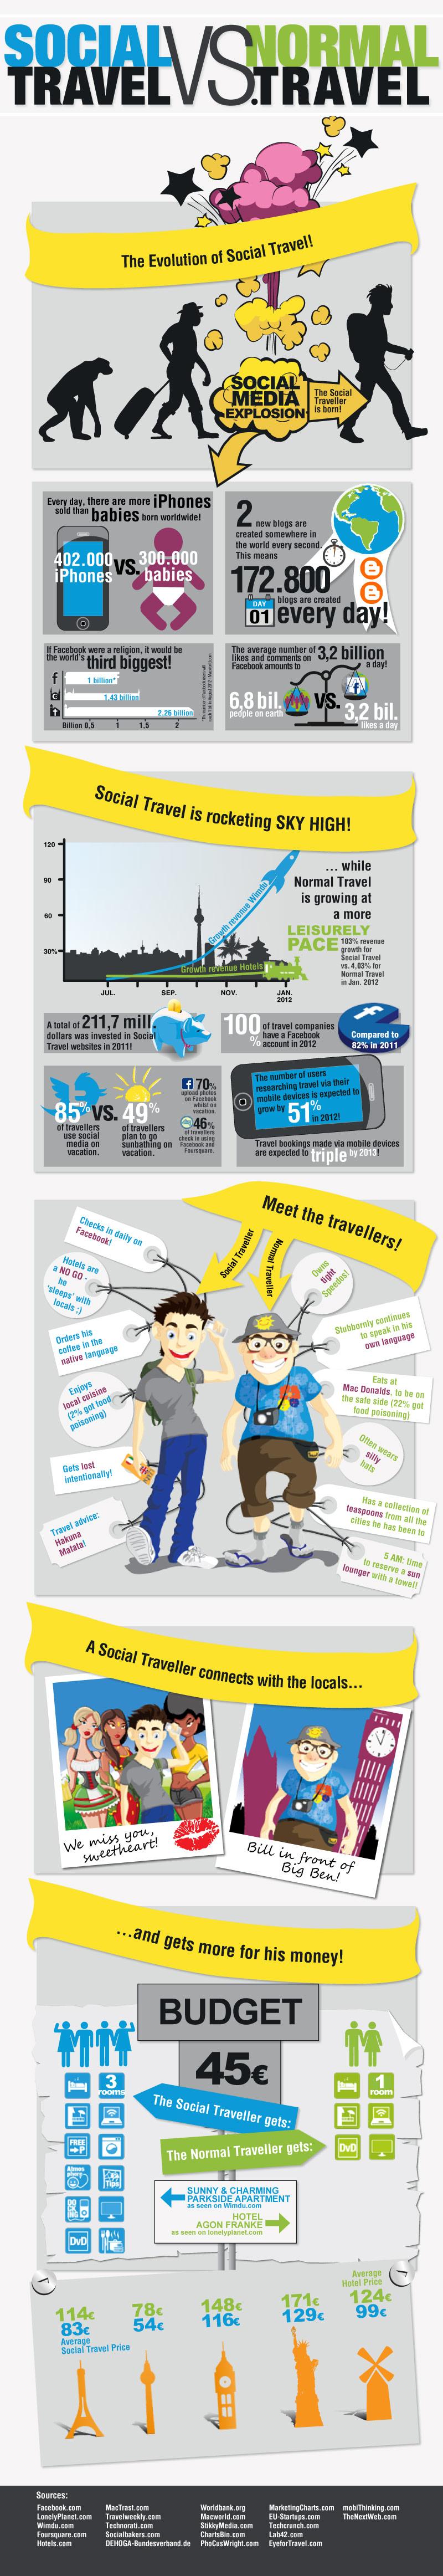 social-vs-normal-travel